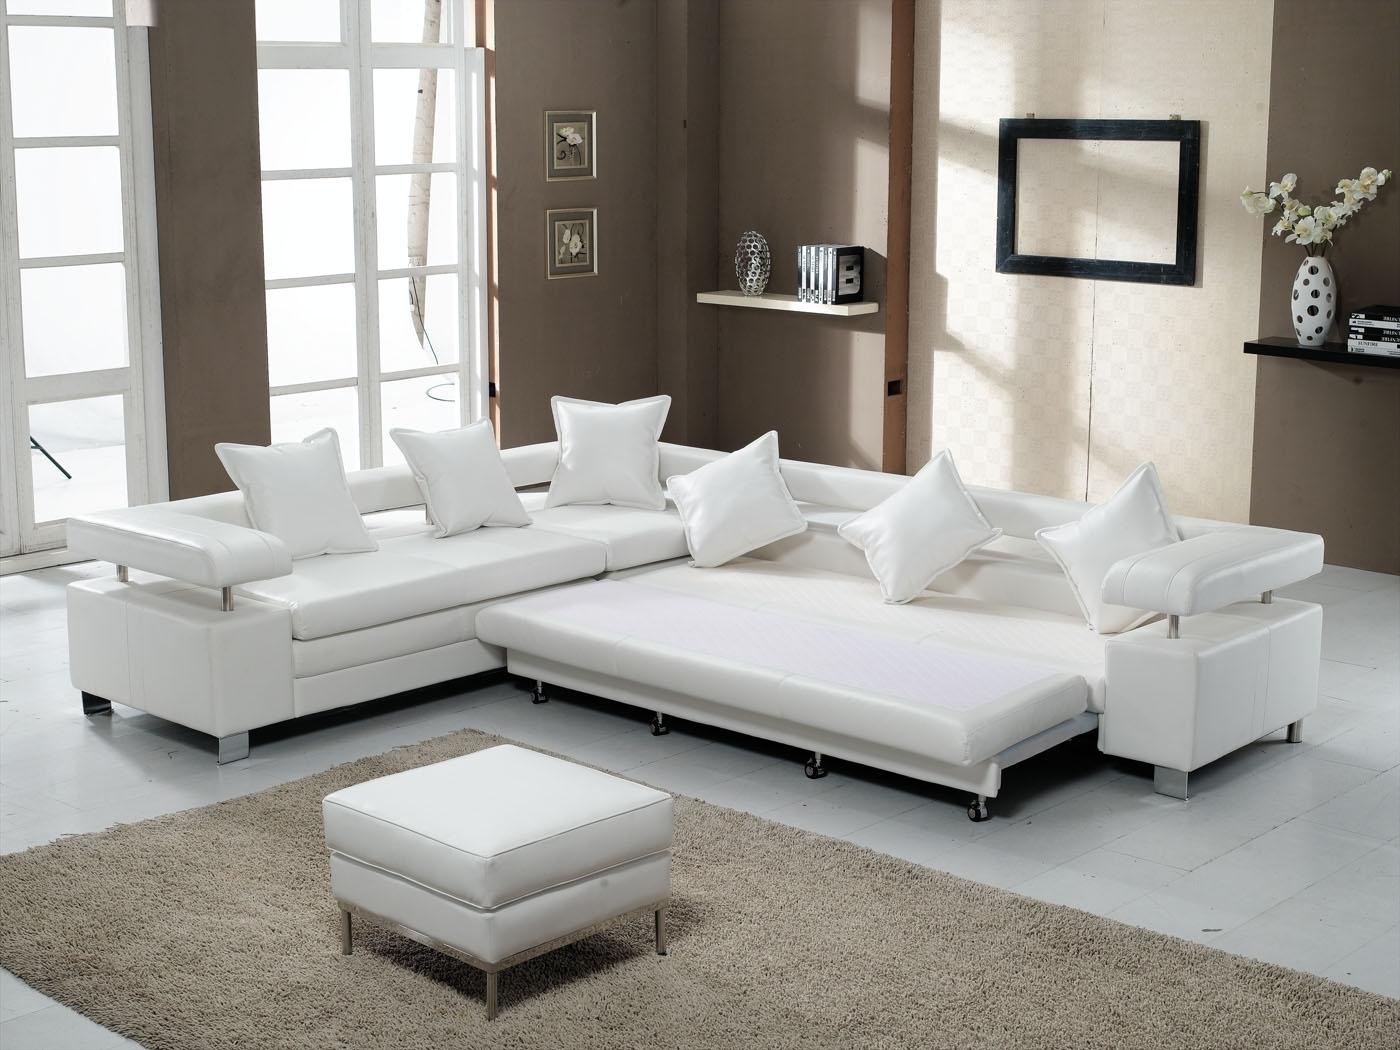 Sleeper Sofa : Microfiber Sectional Sofa 3 Piece Sectional Sofa throughout 3 Piece Sectional Sleeper Sofas (Image 10 of 10)